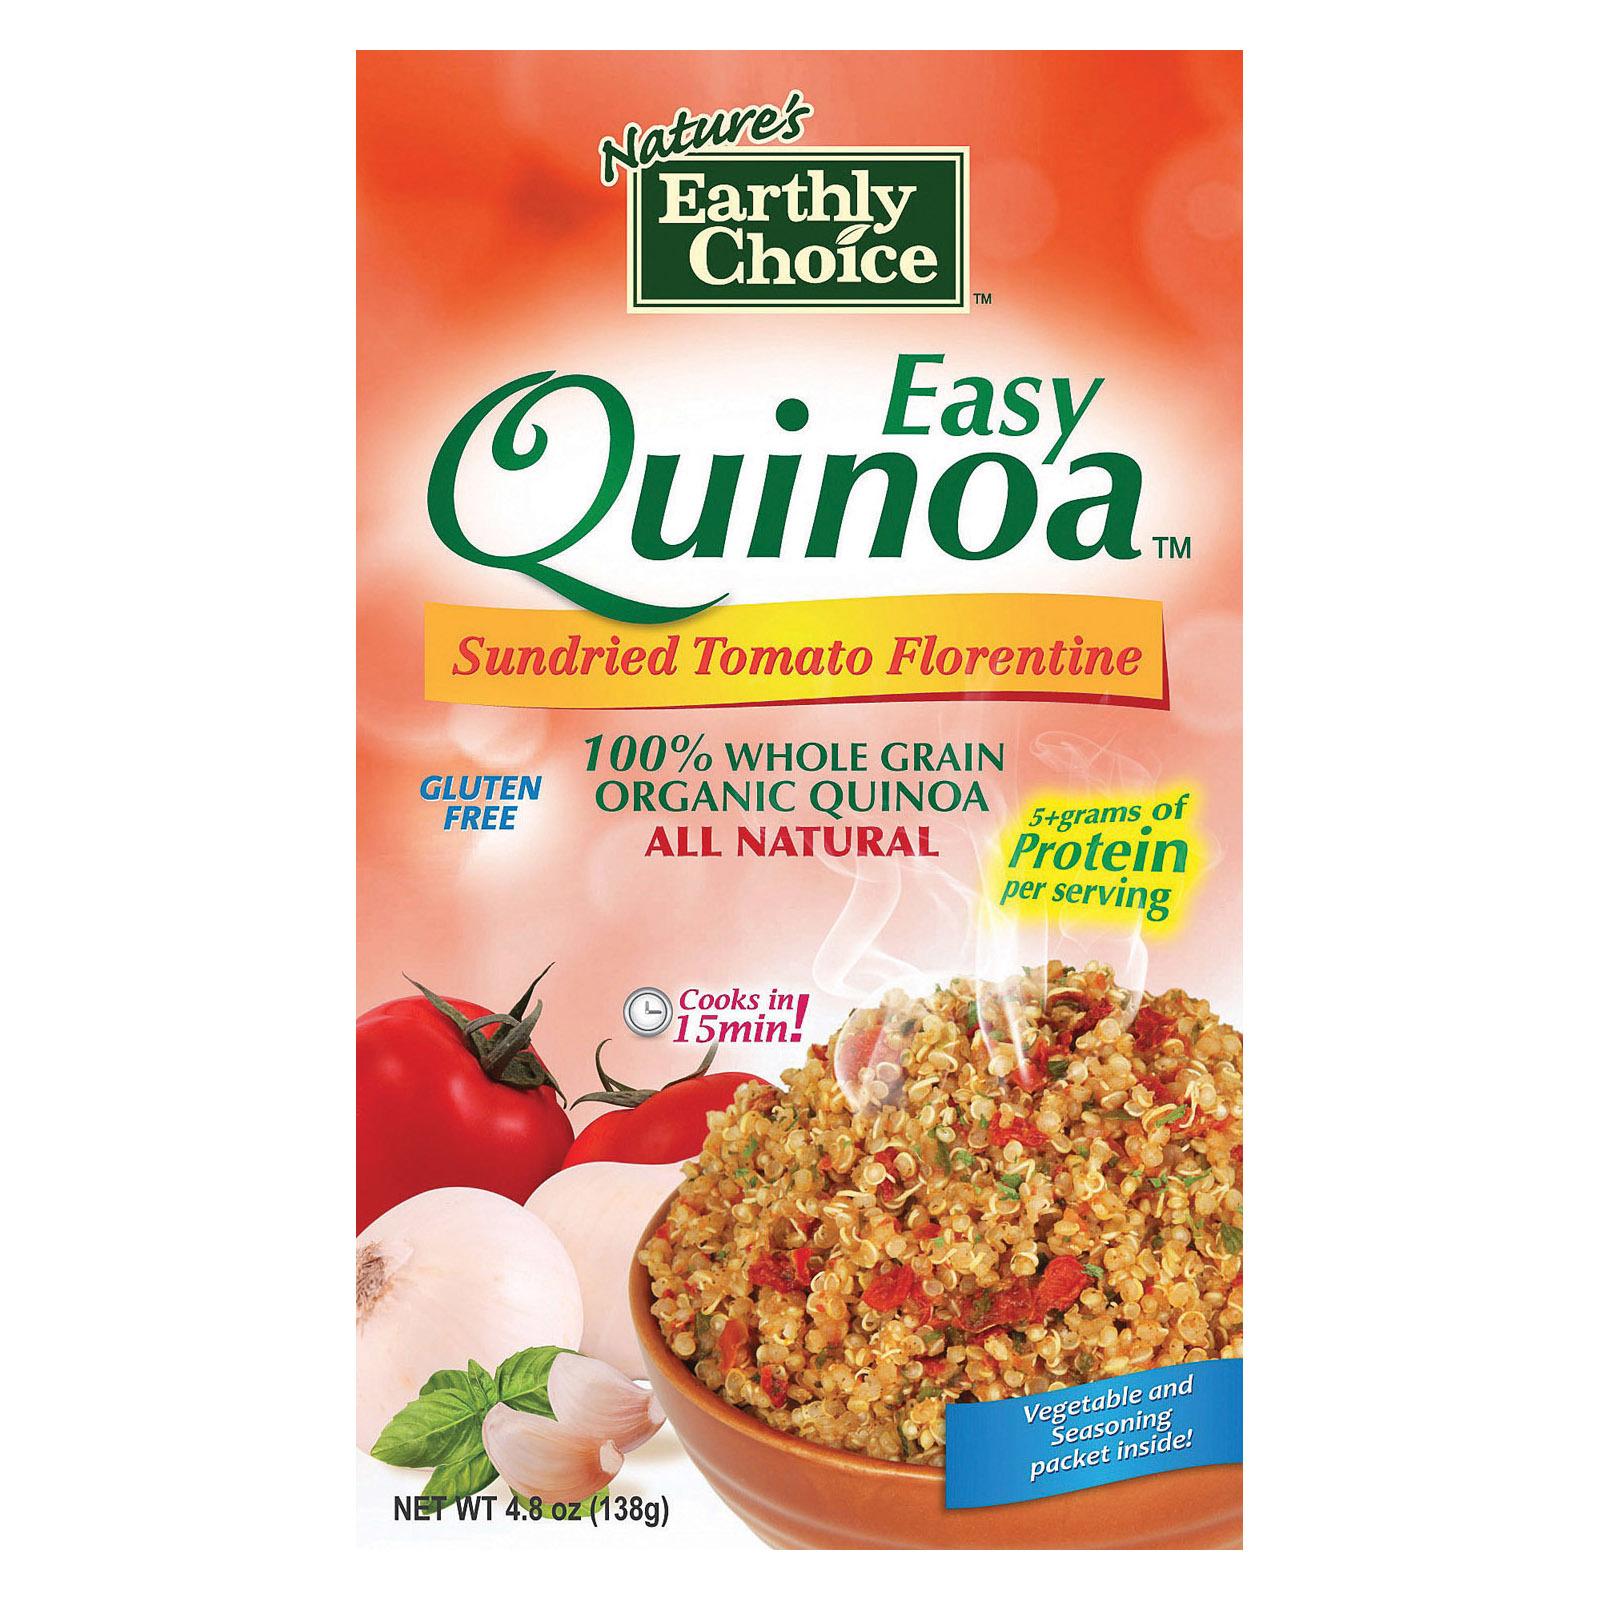 Nature's Earthly Choice Easy Quinoa - Tomato - Case of 6 - 4.8 oz.